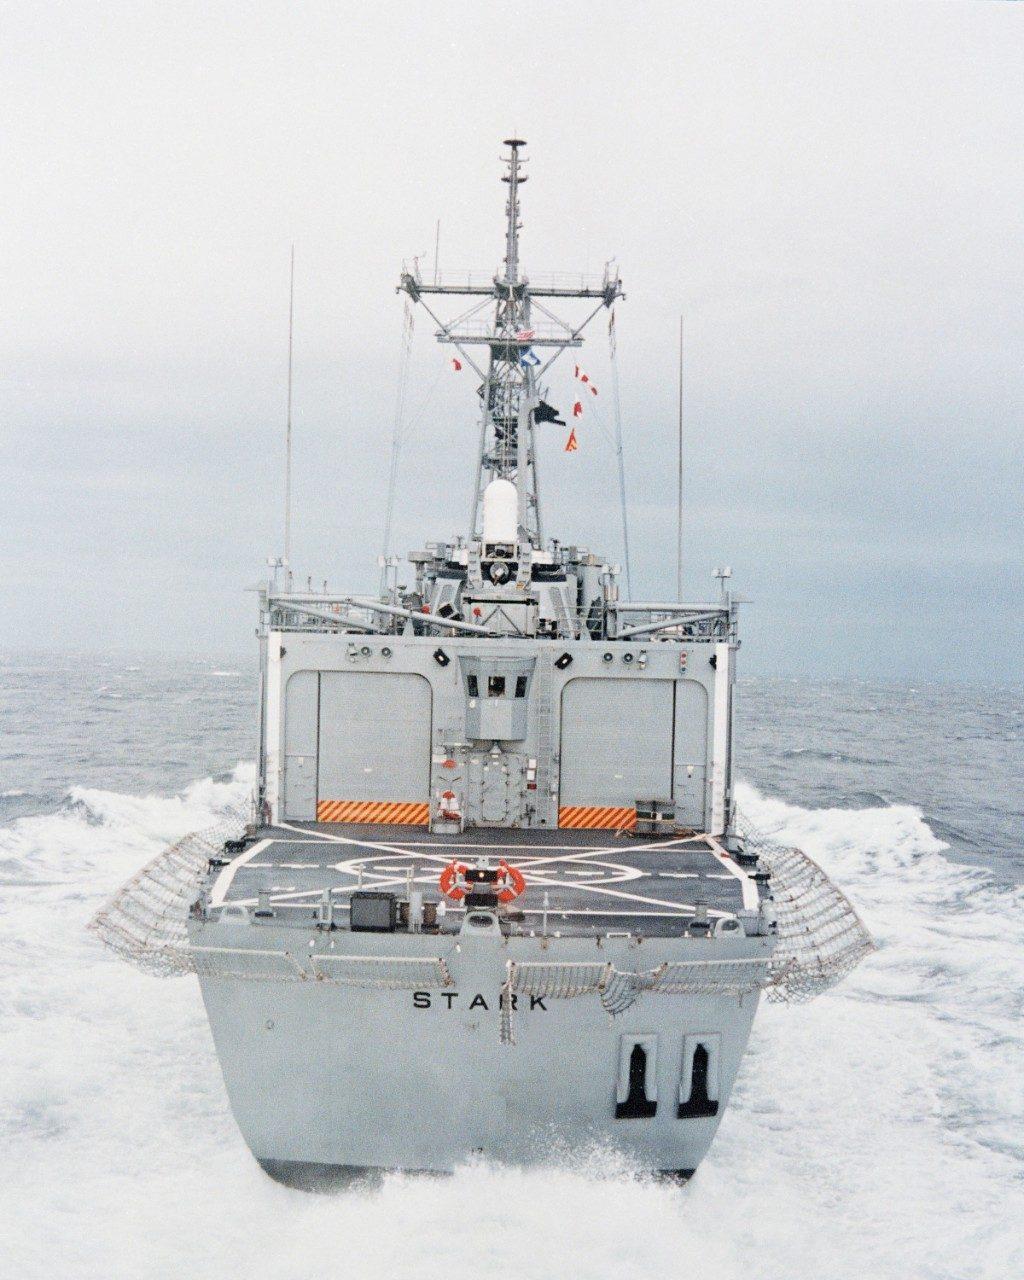 USS Stark vista pela popa. O CIWS Phalanx pode ser visto sobre o hangar